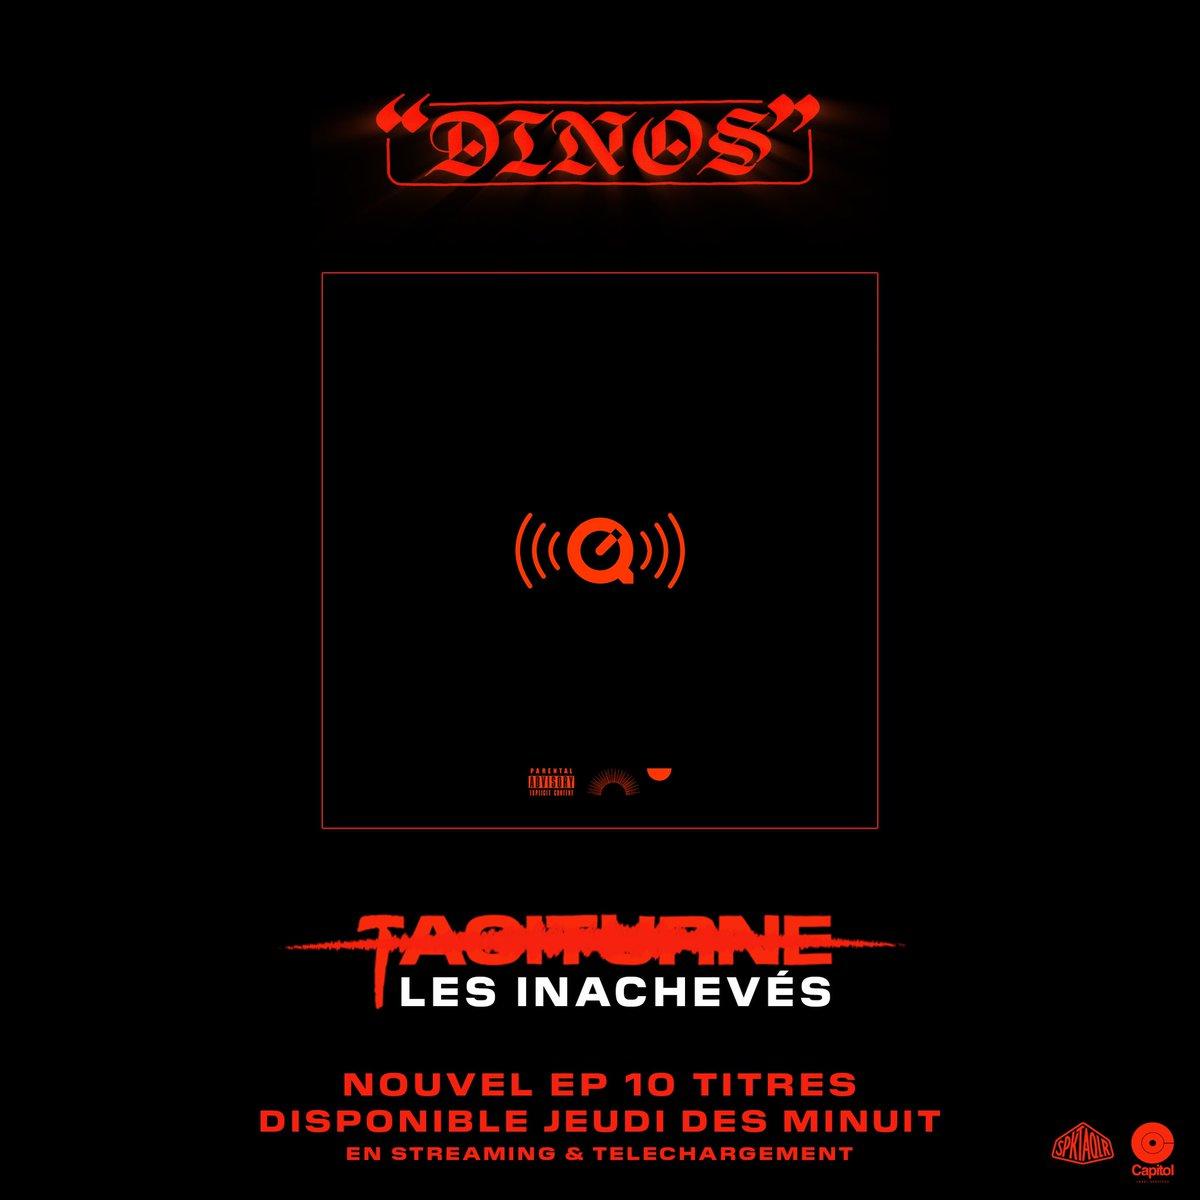 "Dinos on Twitter: ""« Taciturne, les inachevés » Nouvel EP demain ..."